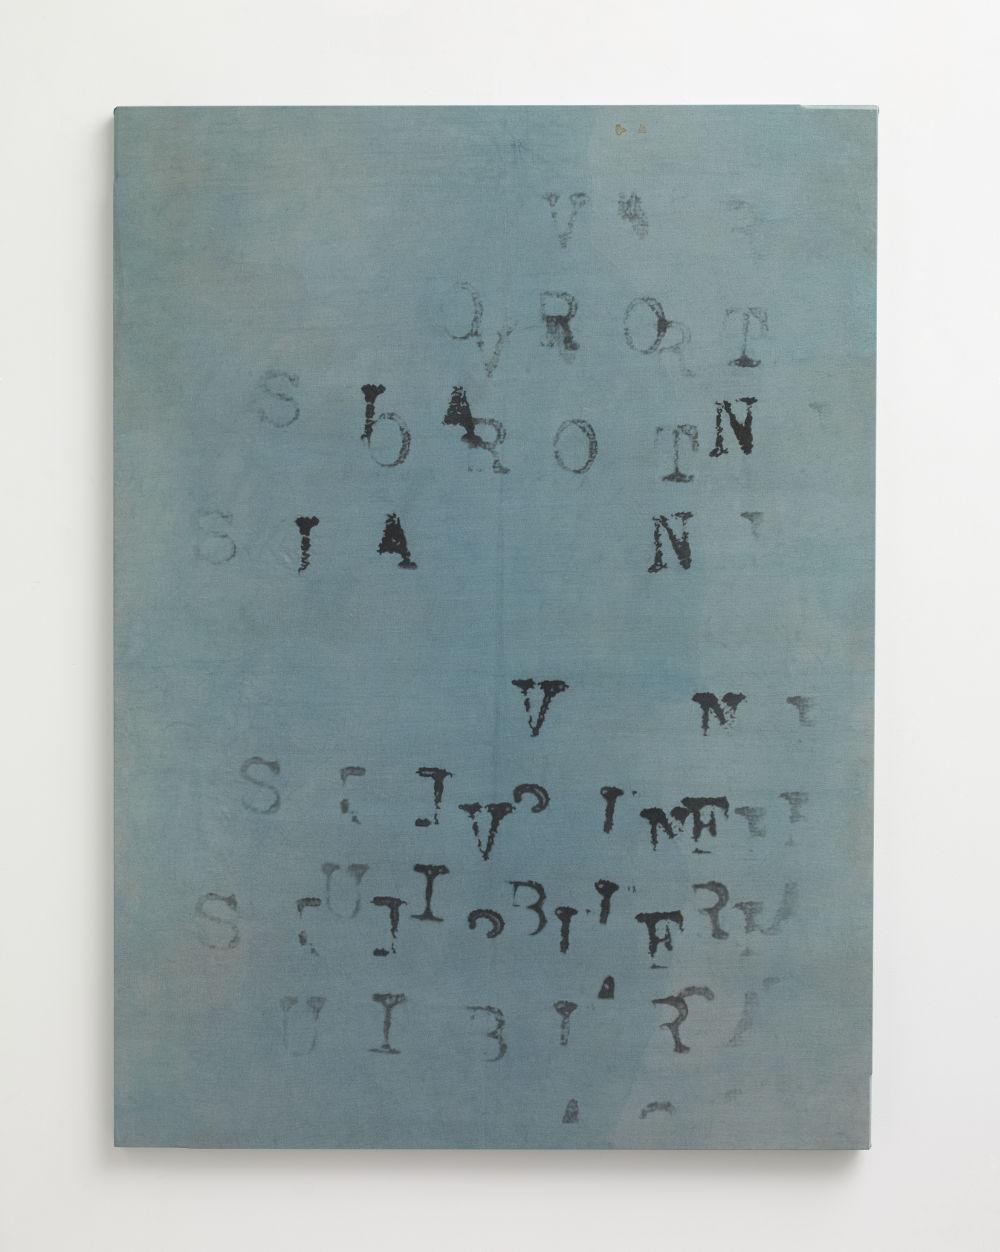 VINCENZO AGNETTI, Oltre il linguaggio, 1970. Photographic enlargement on emulsioned canvas 43 7/16 x 31 11/16 inches (110.3 x 80.5 cm) Framed: 44 1/2 x 32 9/16 inches (113 x 82.7 cm). Courtesy Lévy Gorvy. Photo: Stephen White